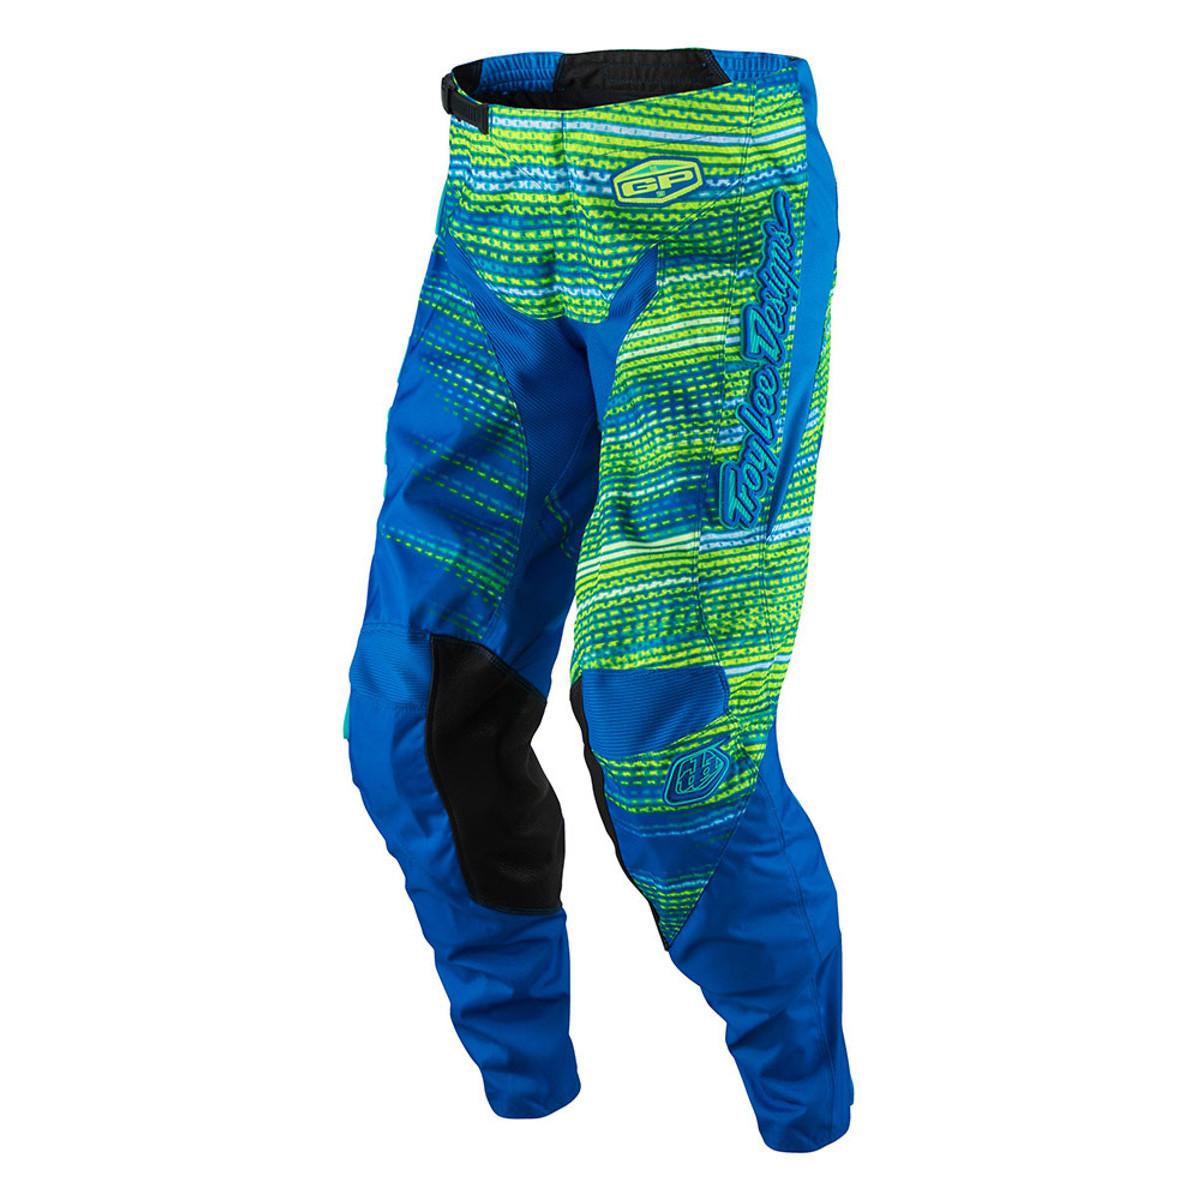 Troy Lee Designs GP Electro Pants Troy Lee Designs GP Electro Blue